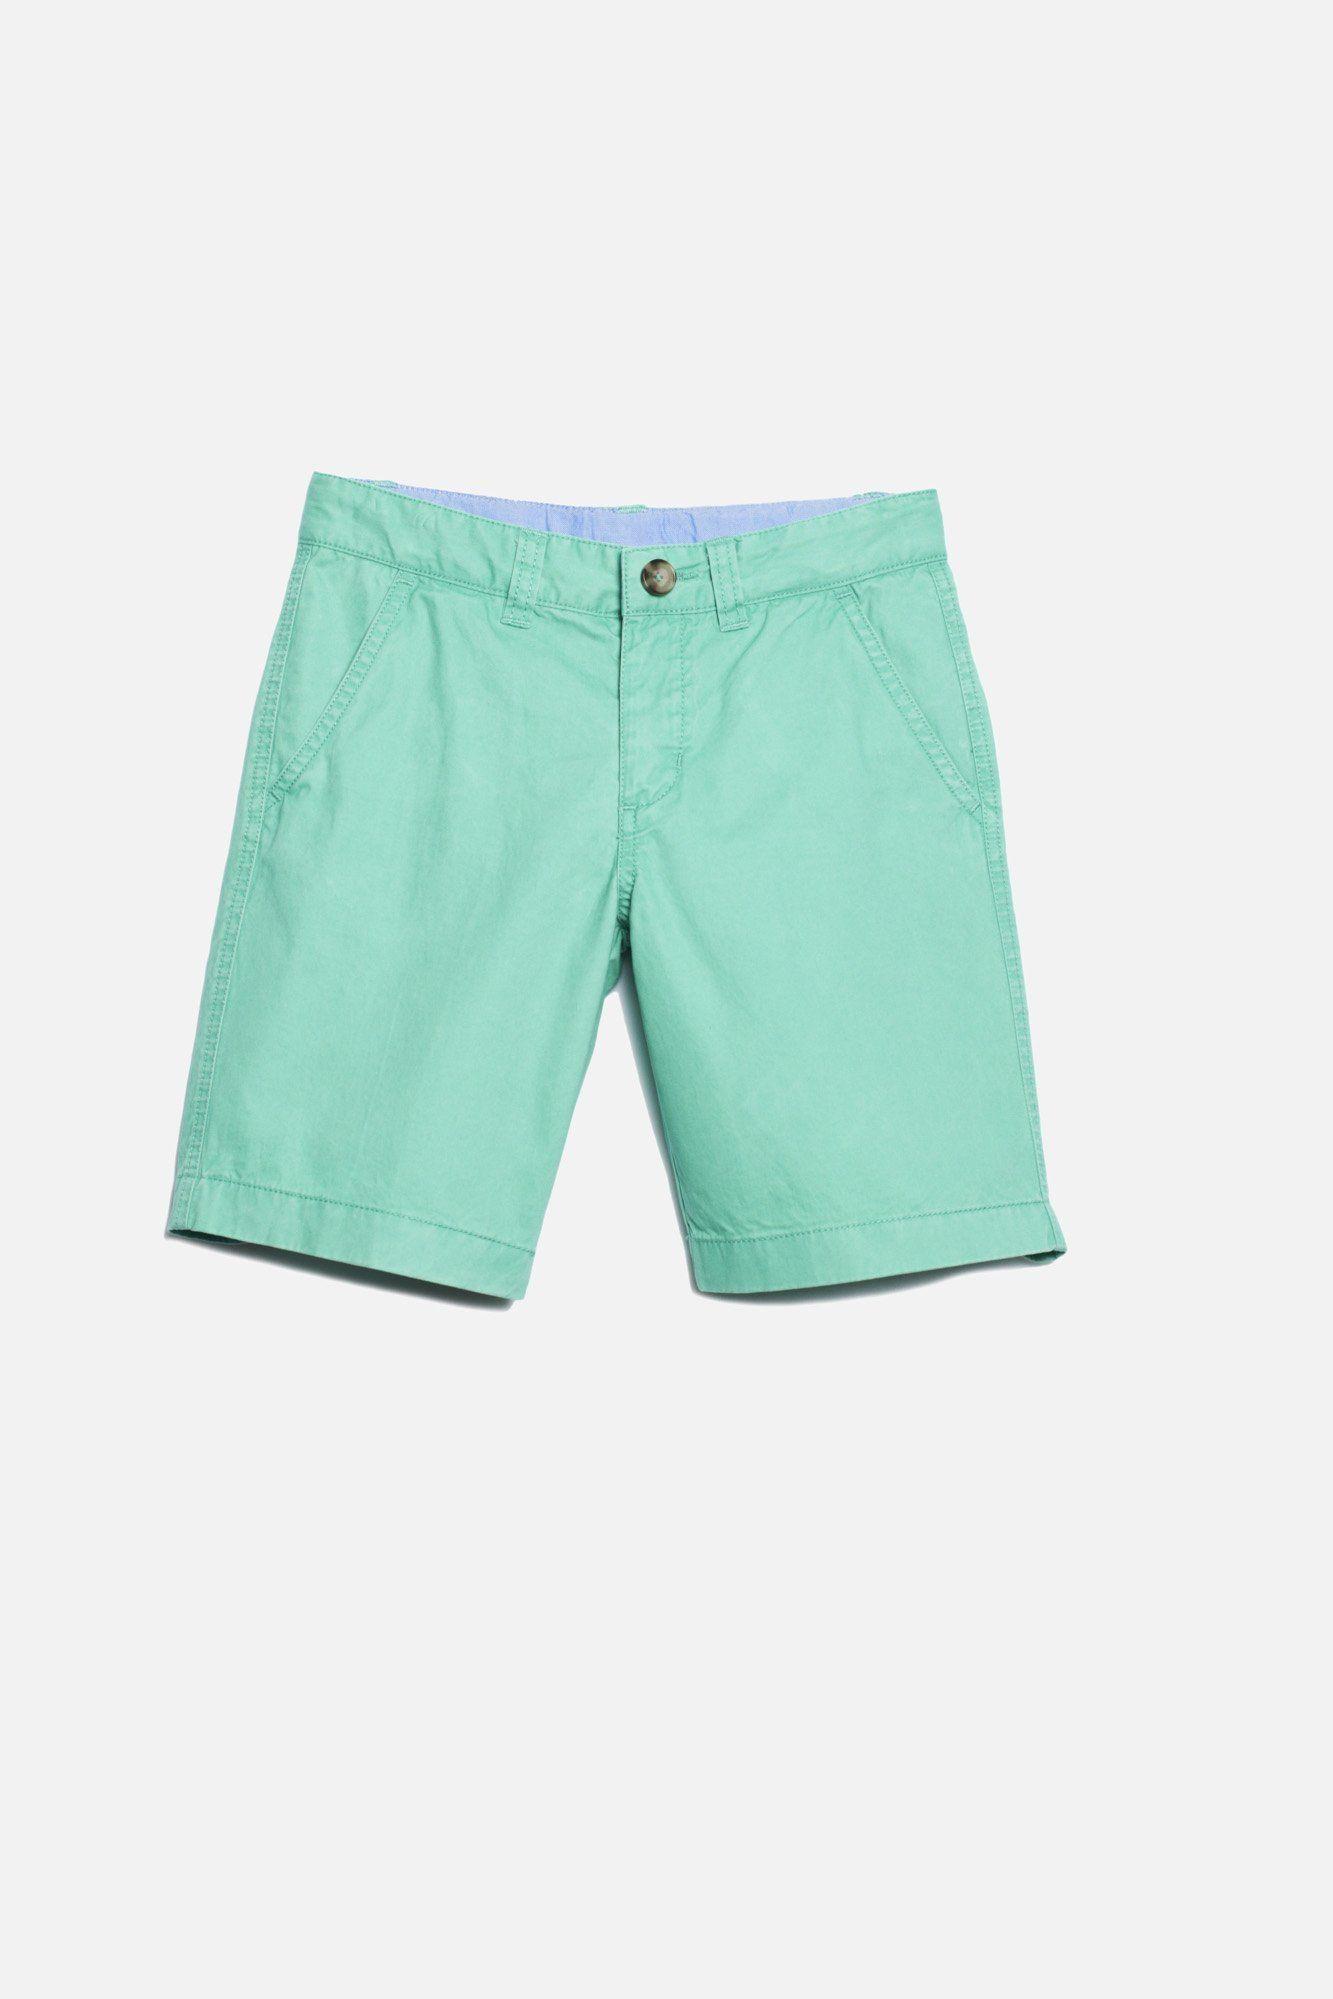 boys lacoste swim shorts